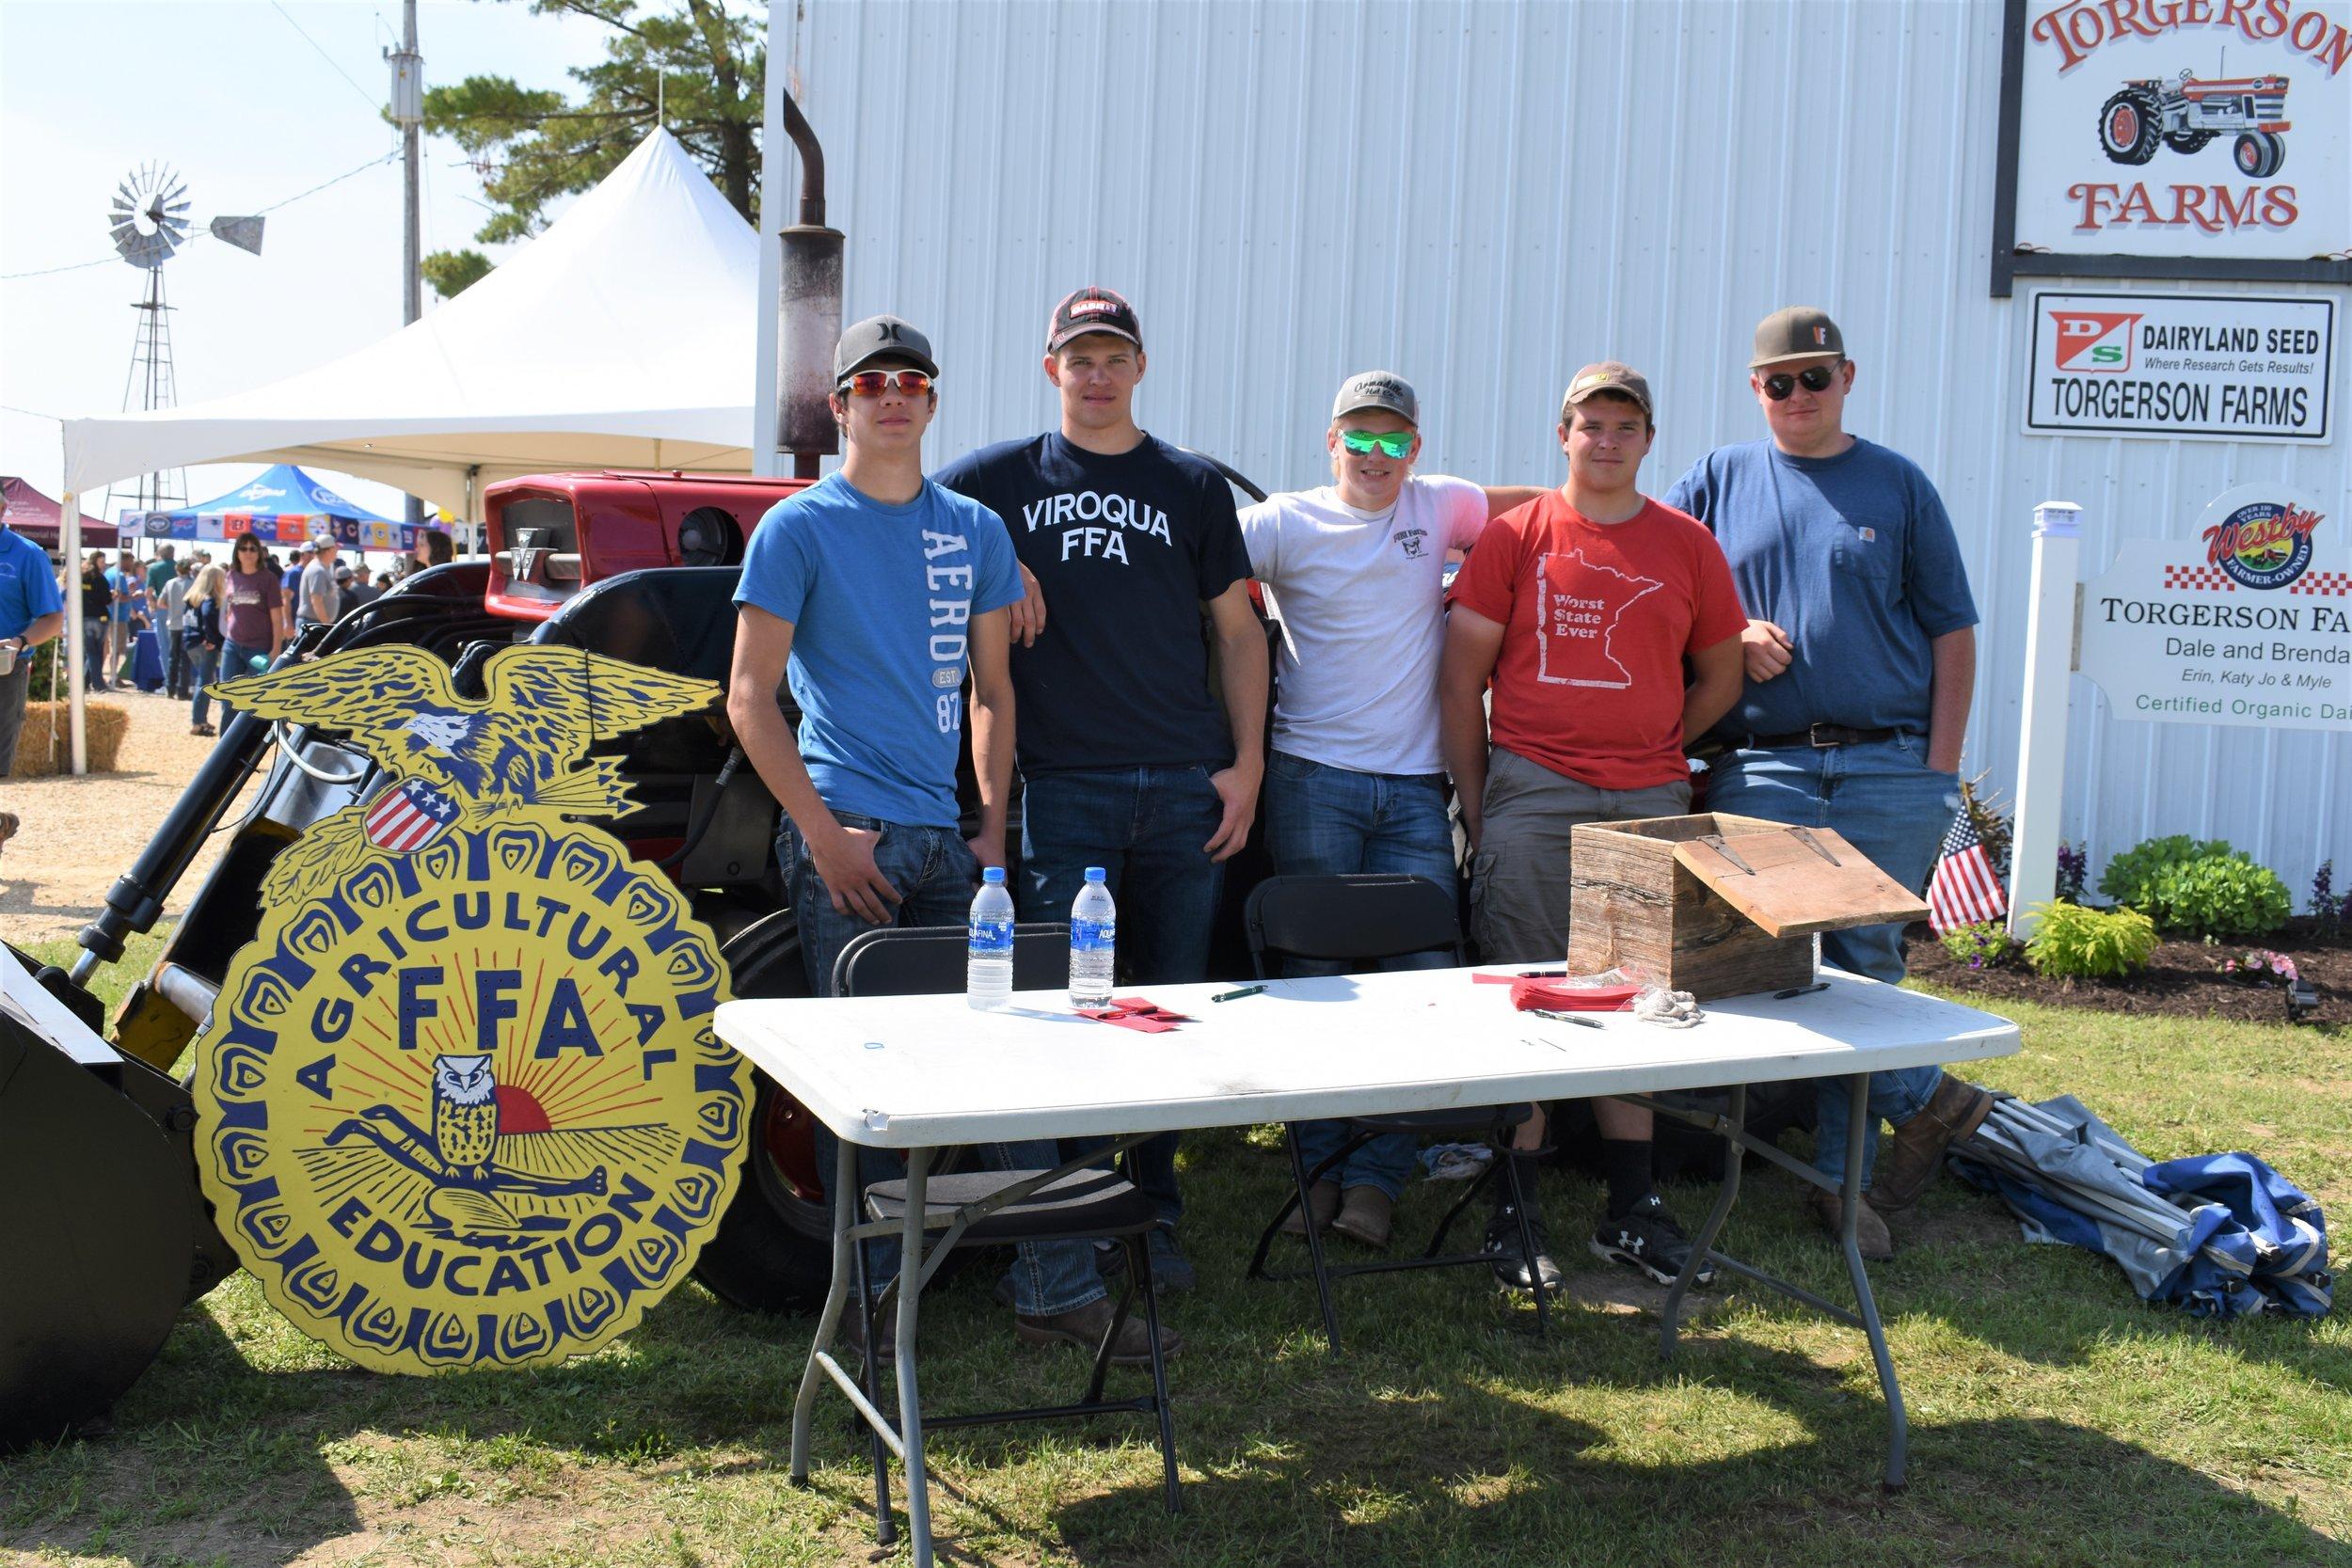 Viroqua FFA members L to R- Jacob Ellefson, Jacob Cunti, Austin Yttre, Dalton Hardy, and Landon Lucey